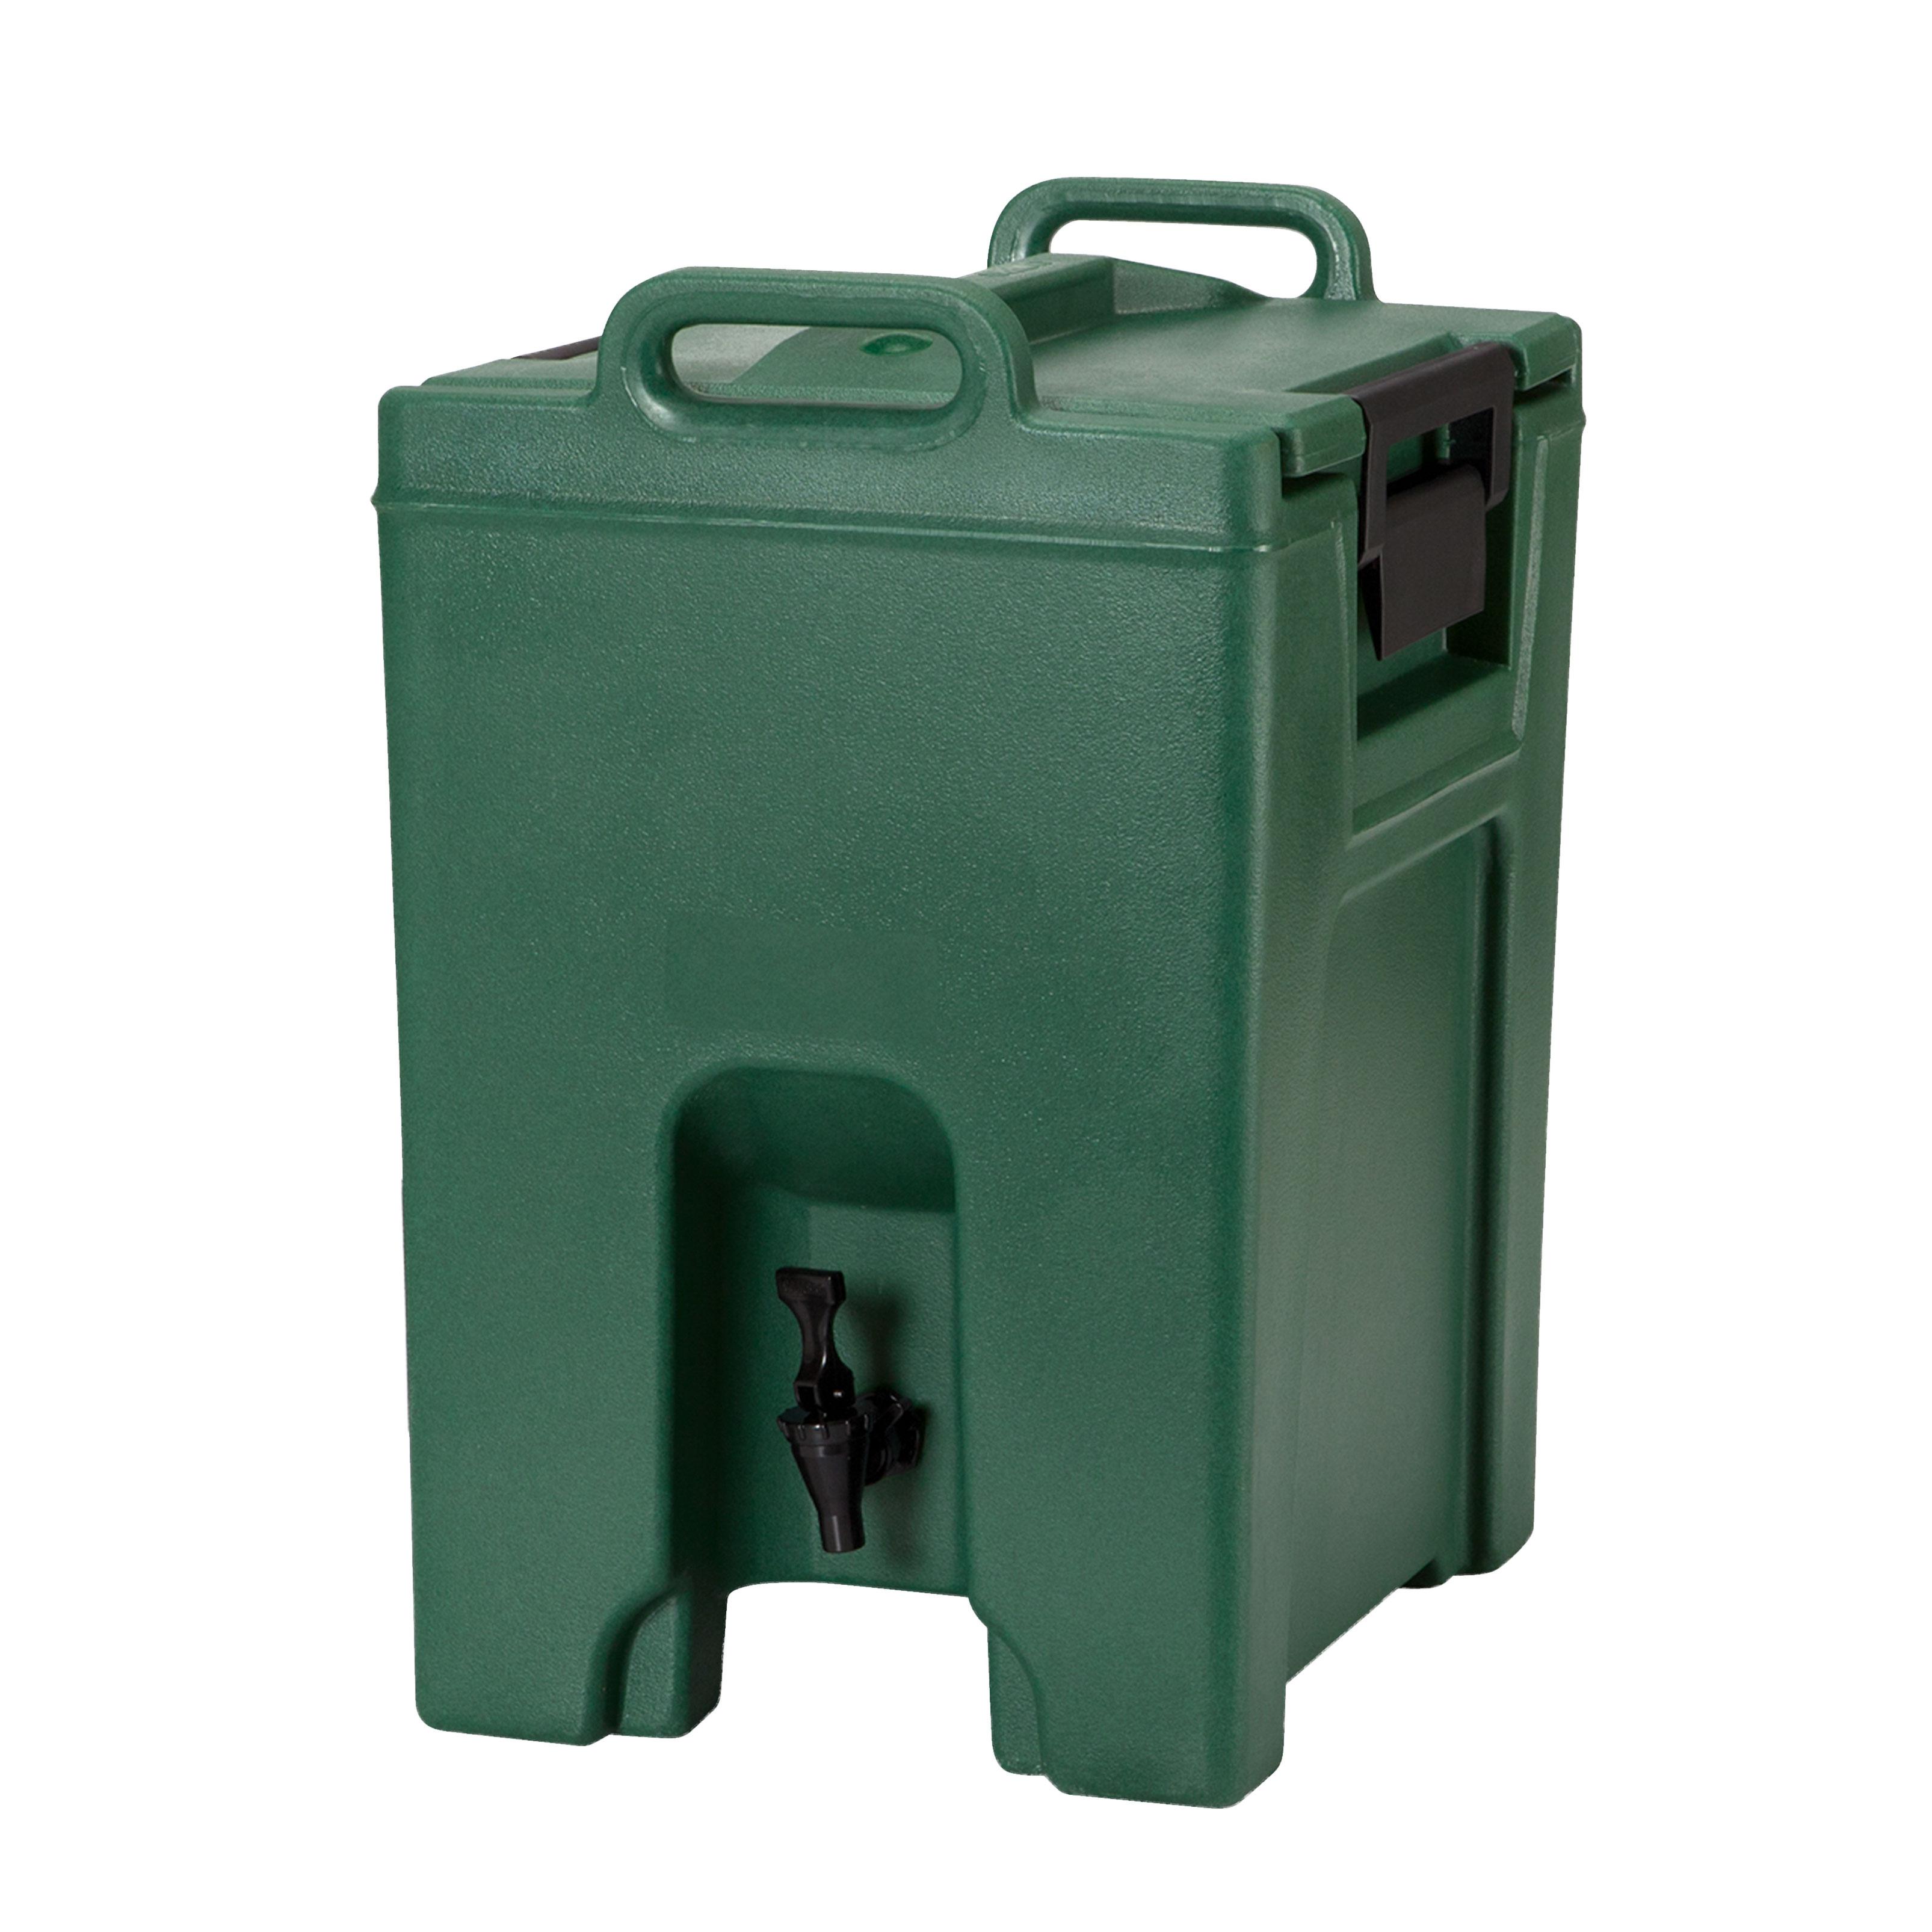 Cambro UC1000519 beverage dispenser, insulated